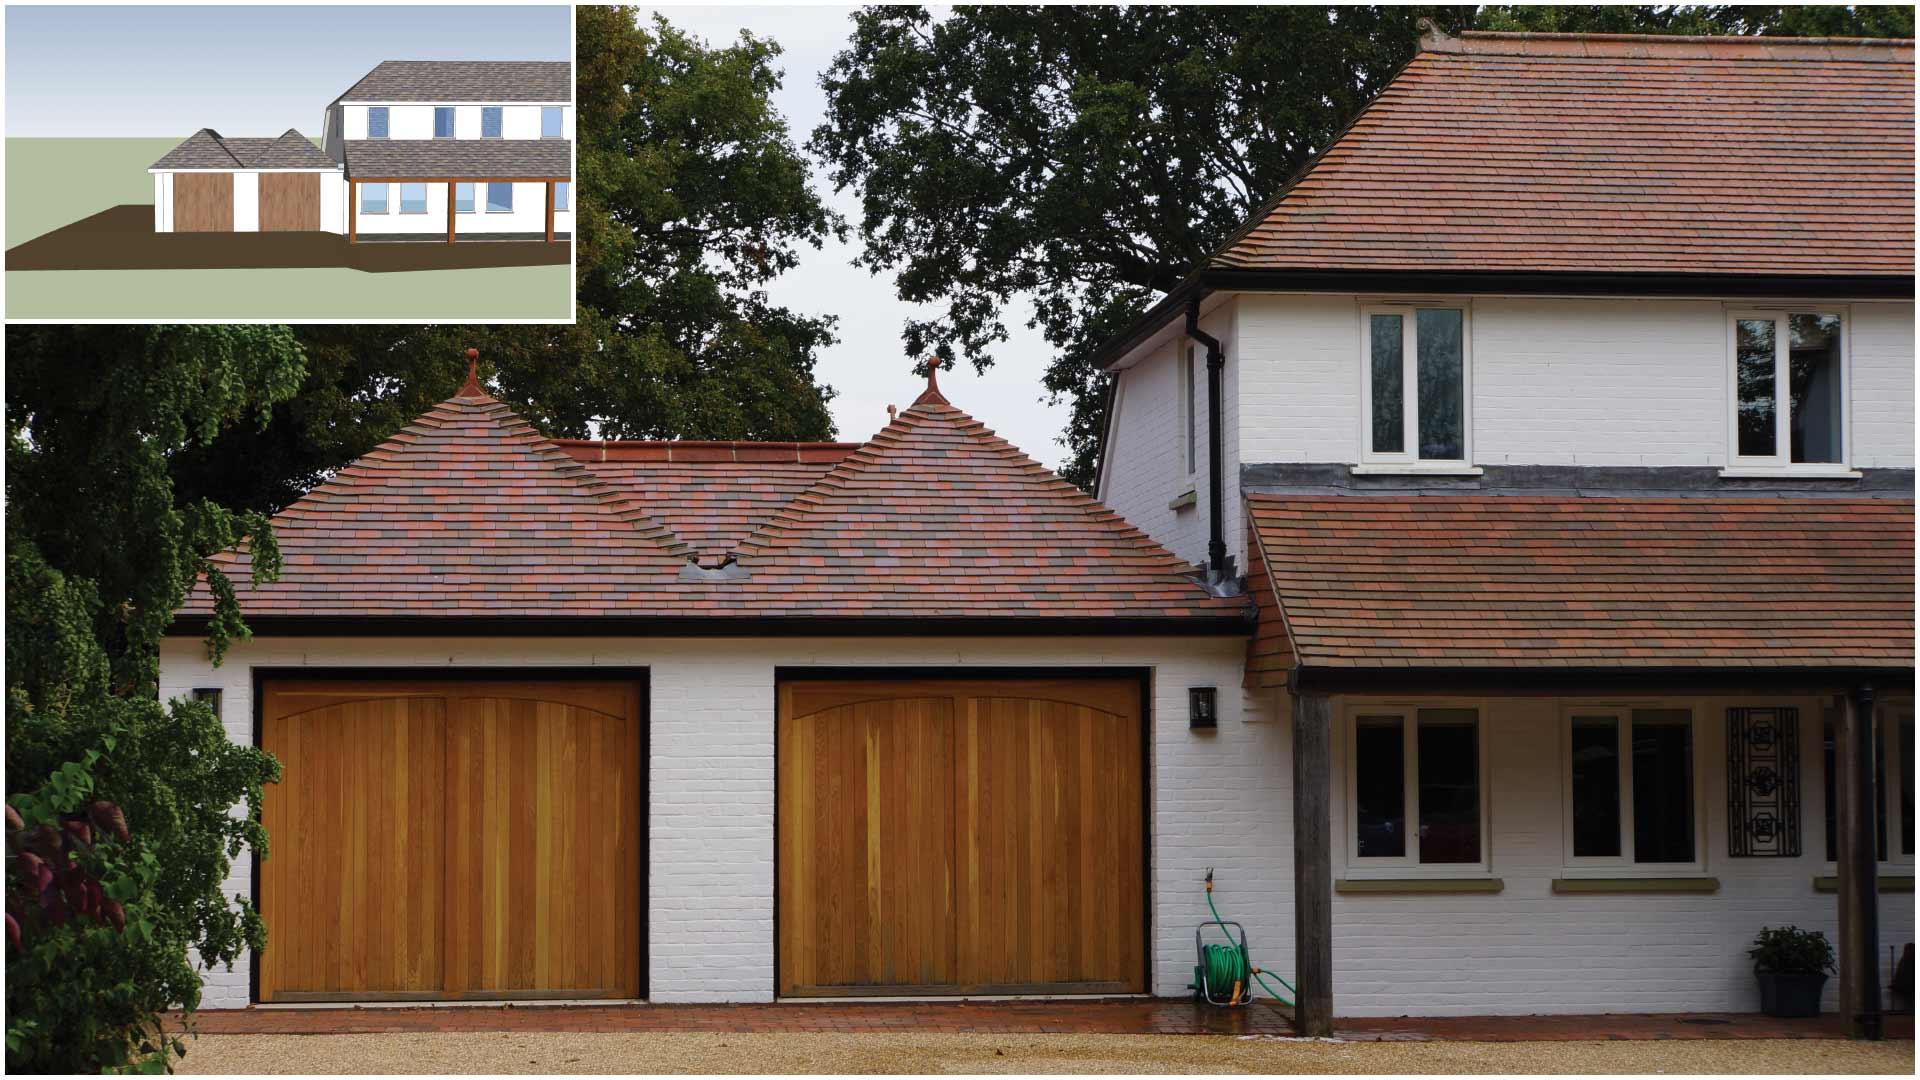 integral garage conversion ideas - PB Properties